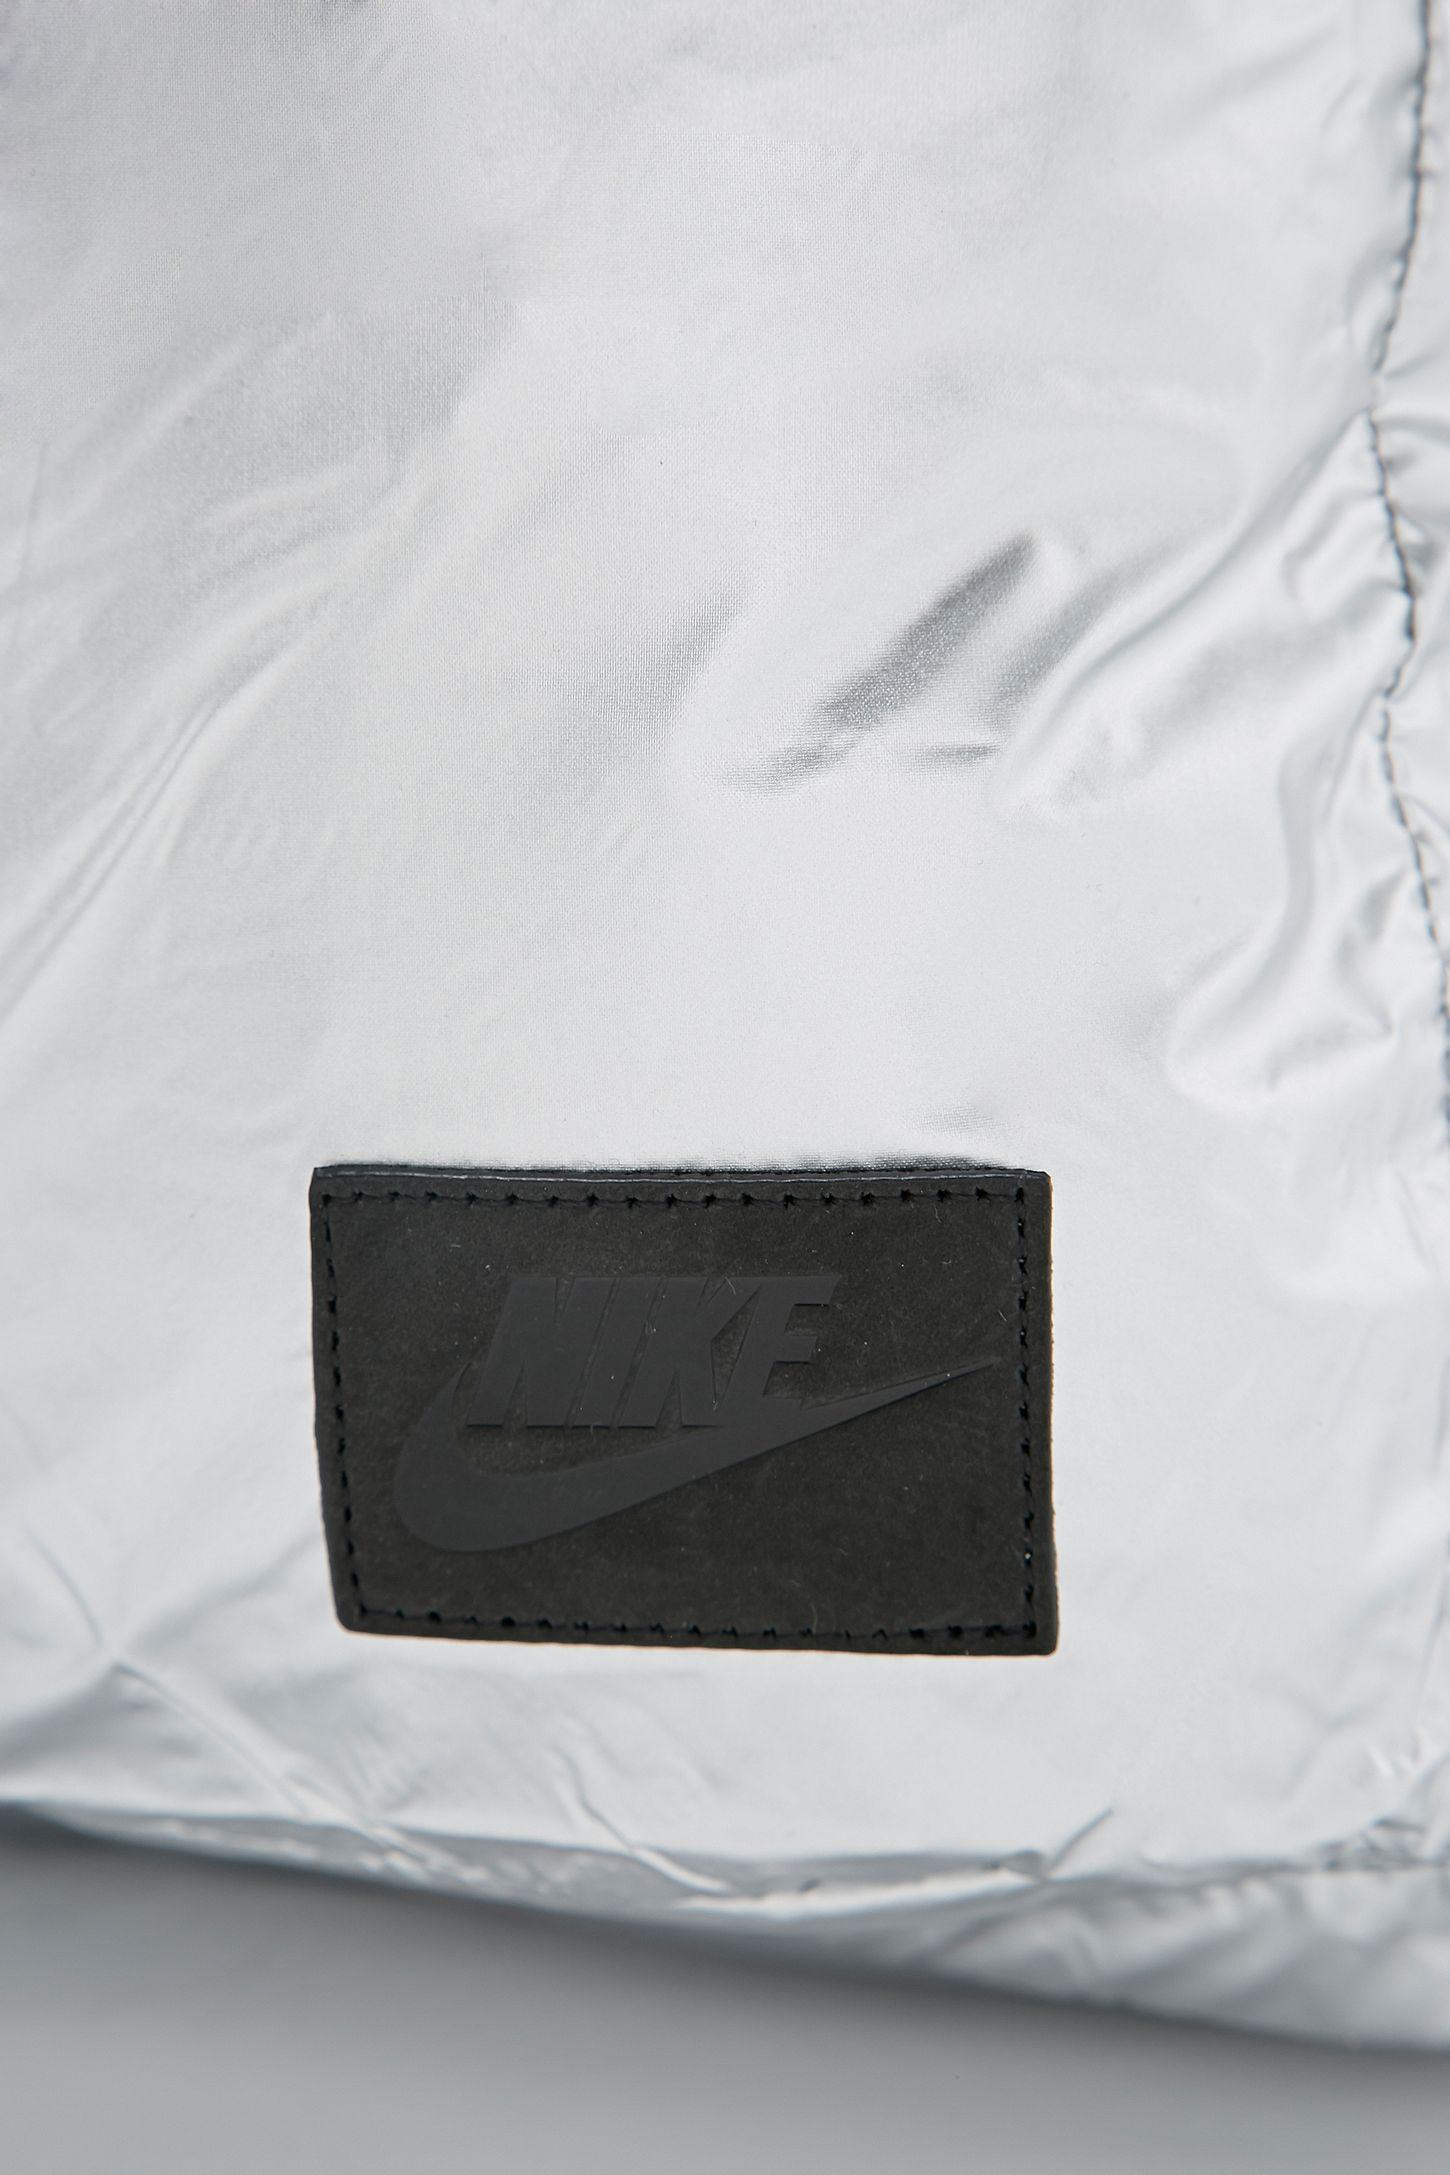 757167417c96 Slide View  6  Nike Metallic London Tote Bag in Silver